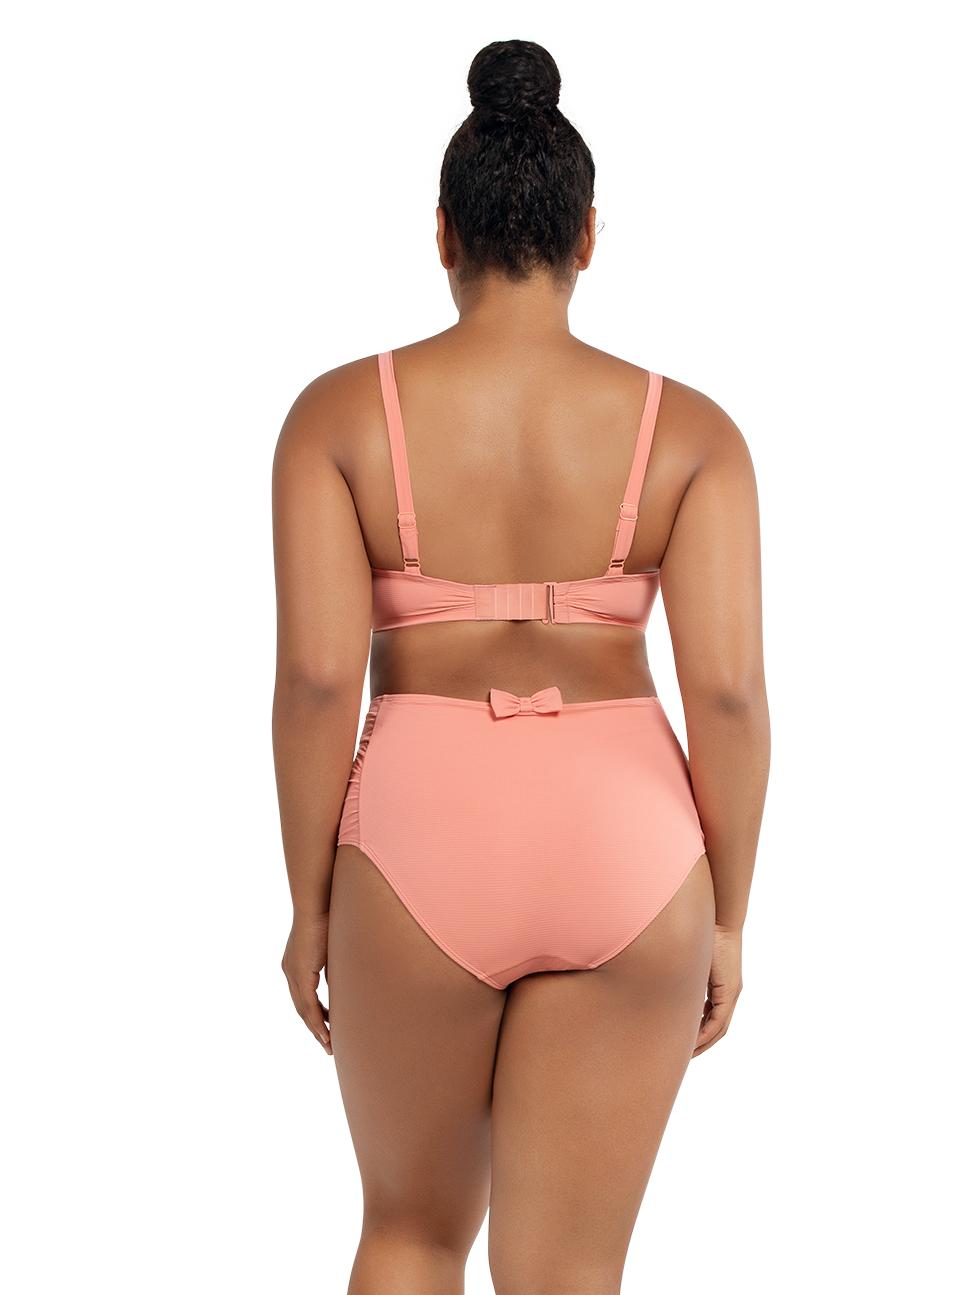 PARFAIT Vivien BalconetteBikiniTopS8162 HighwaistedBottomS8165 PinkBlush Back - Vivien Balconette Bikini Top Pink Blush S8162